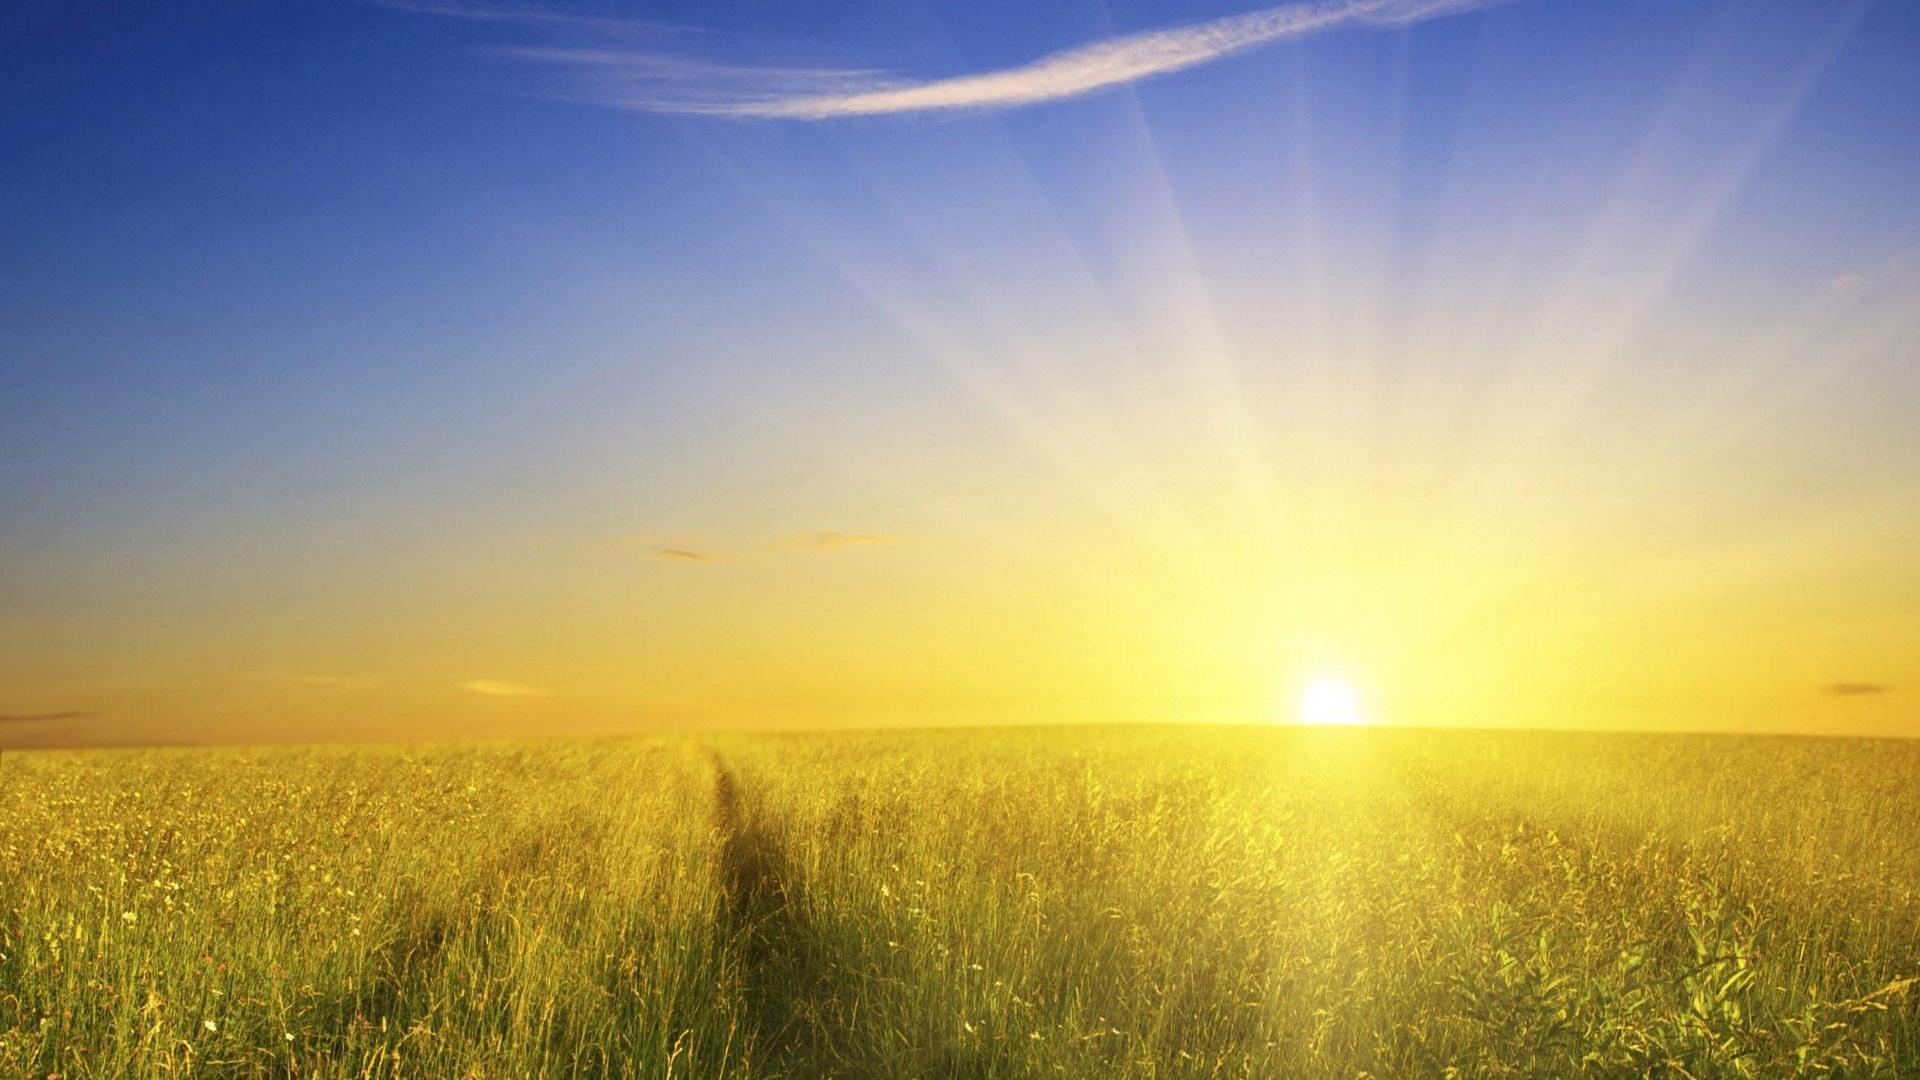 sunshine background 26240 1920x1080 px hdwallsource